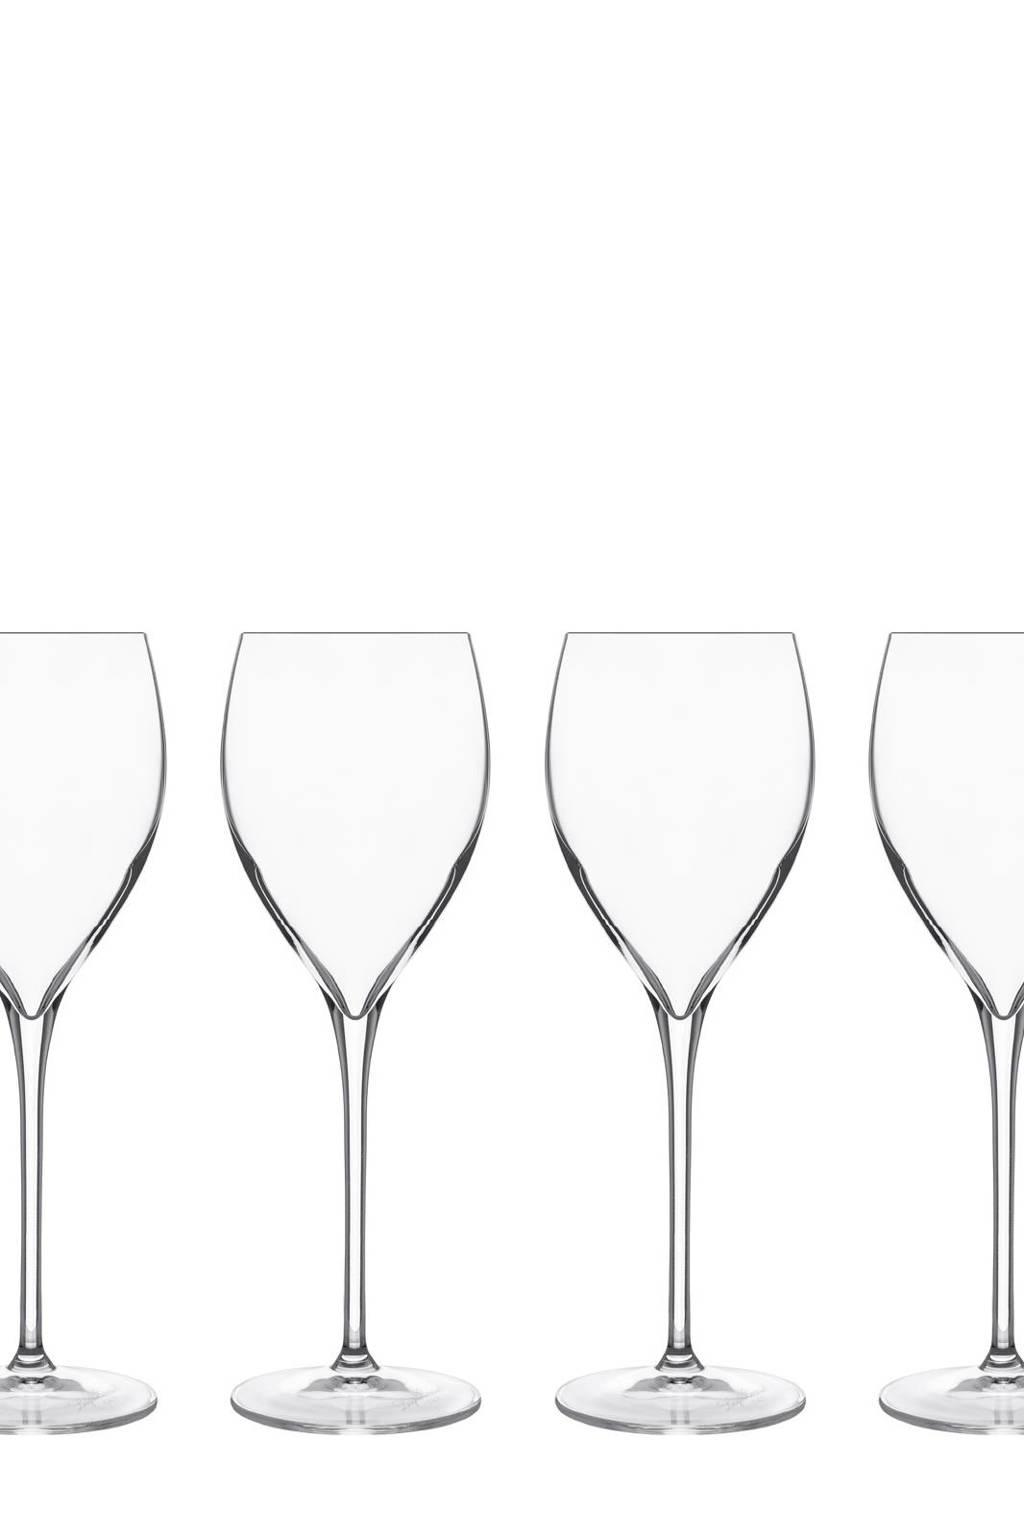 Luigi Bormioli Magnifico wijnglas (Ø8,2 cm) (set van 4), Transparant